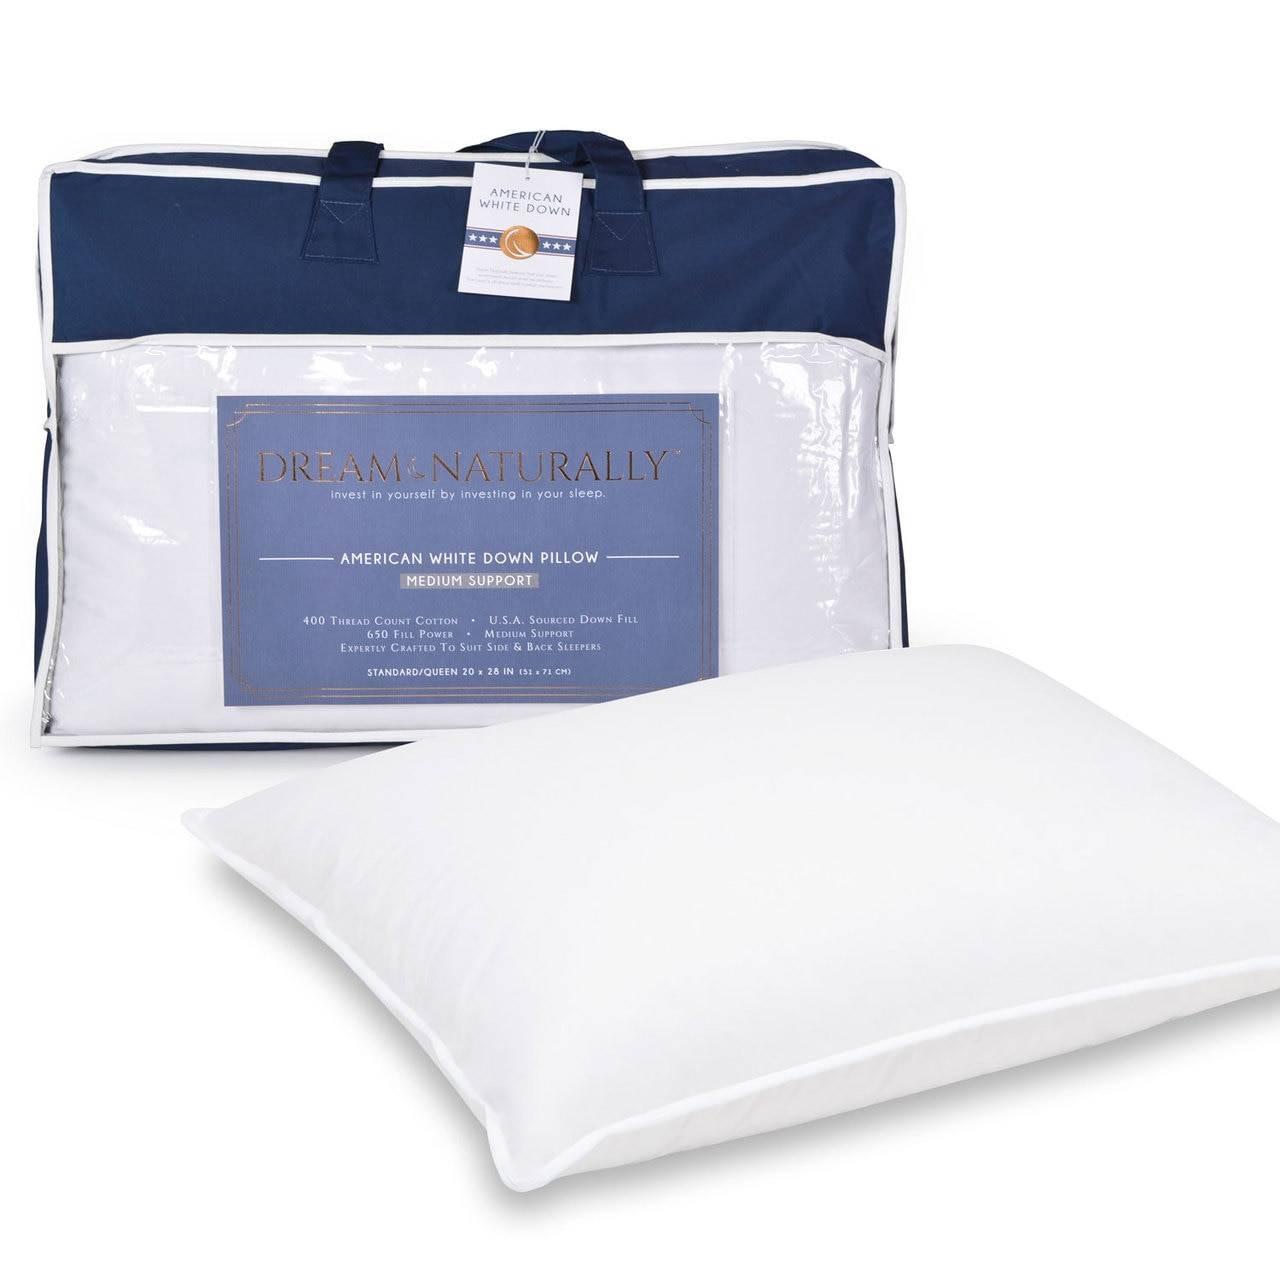 dream naturally 650 fill power 400 tc usa down pillow multiple densities